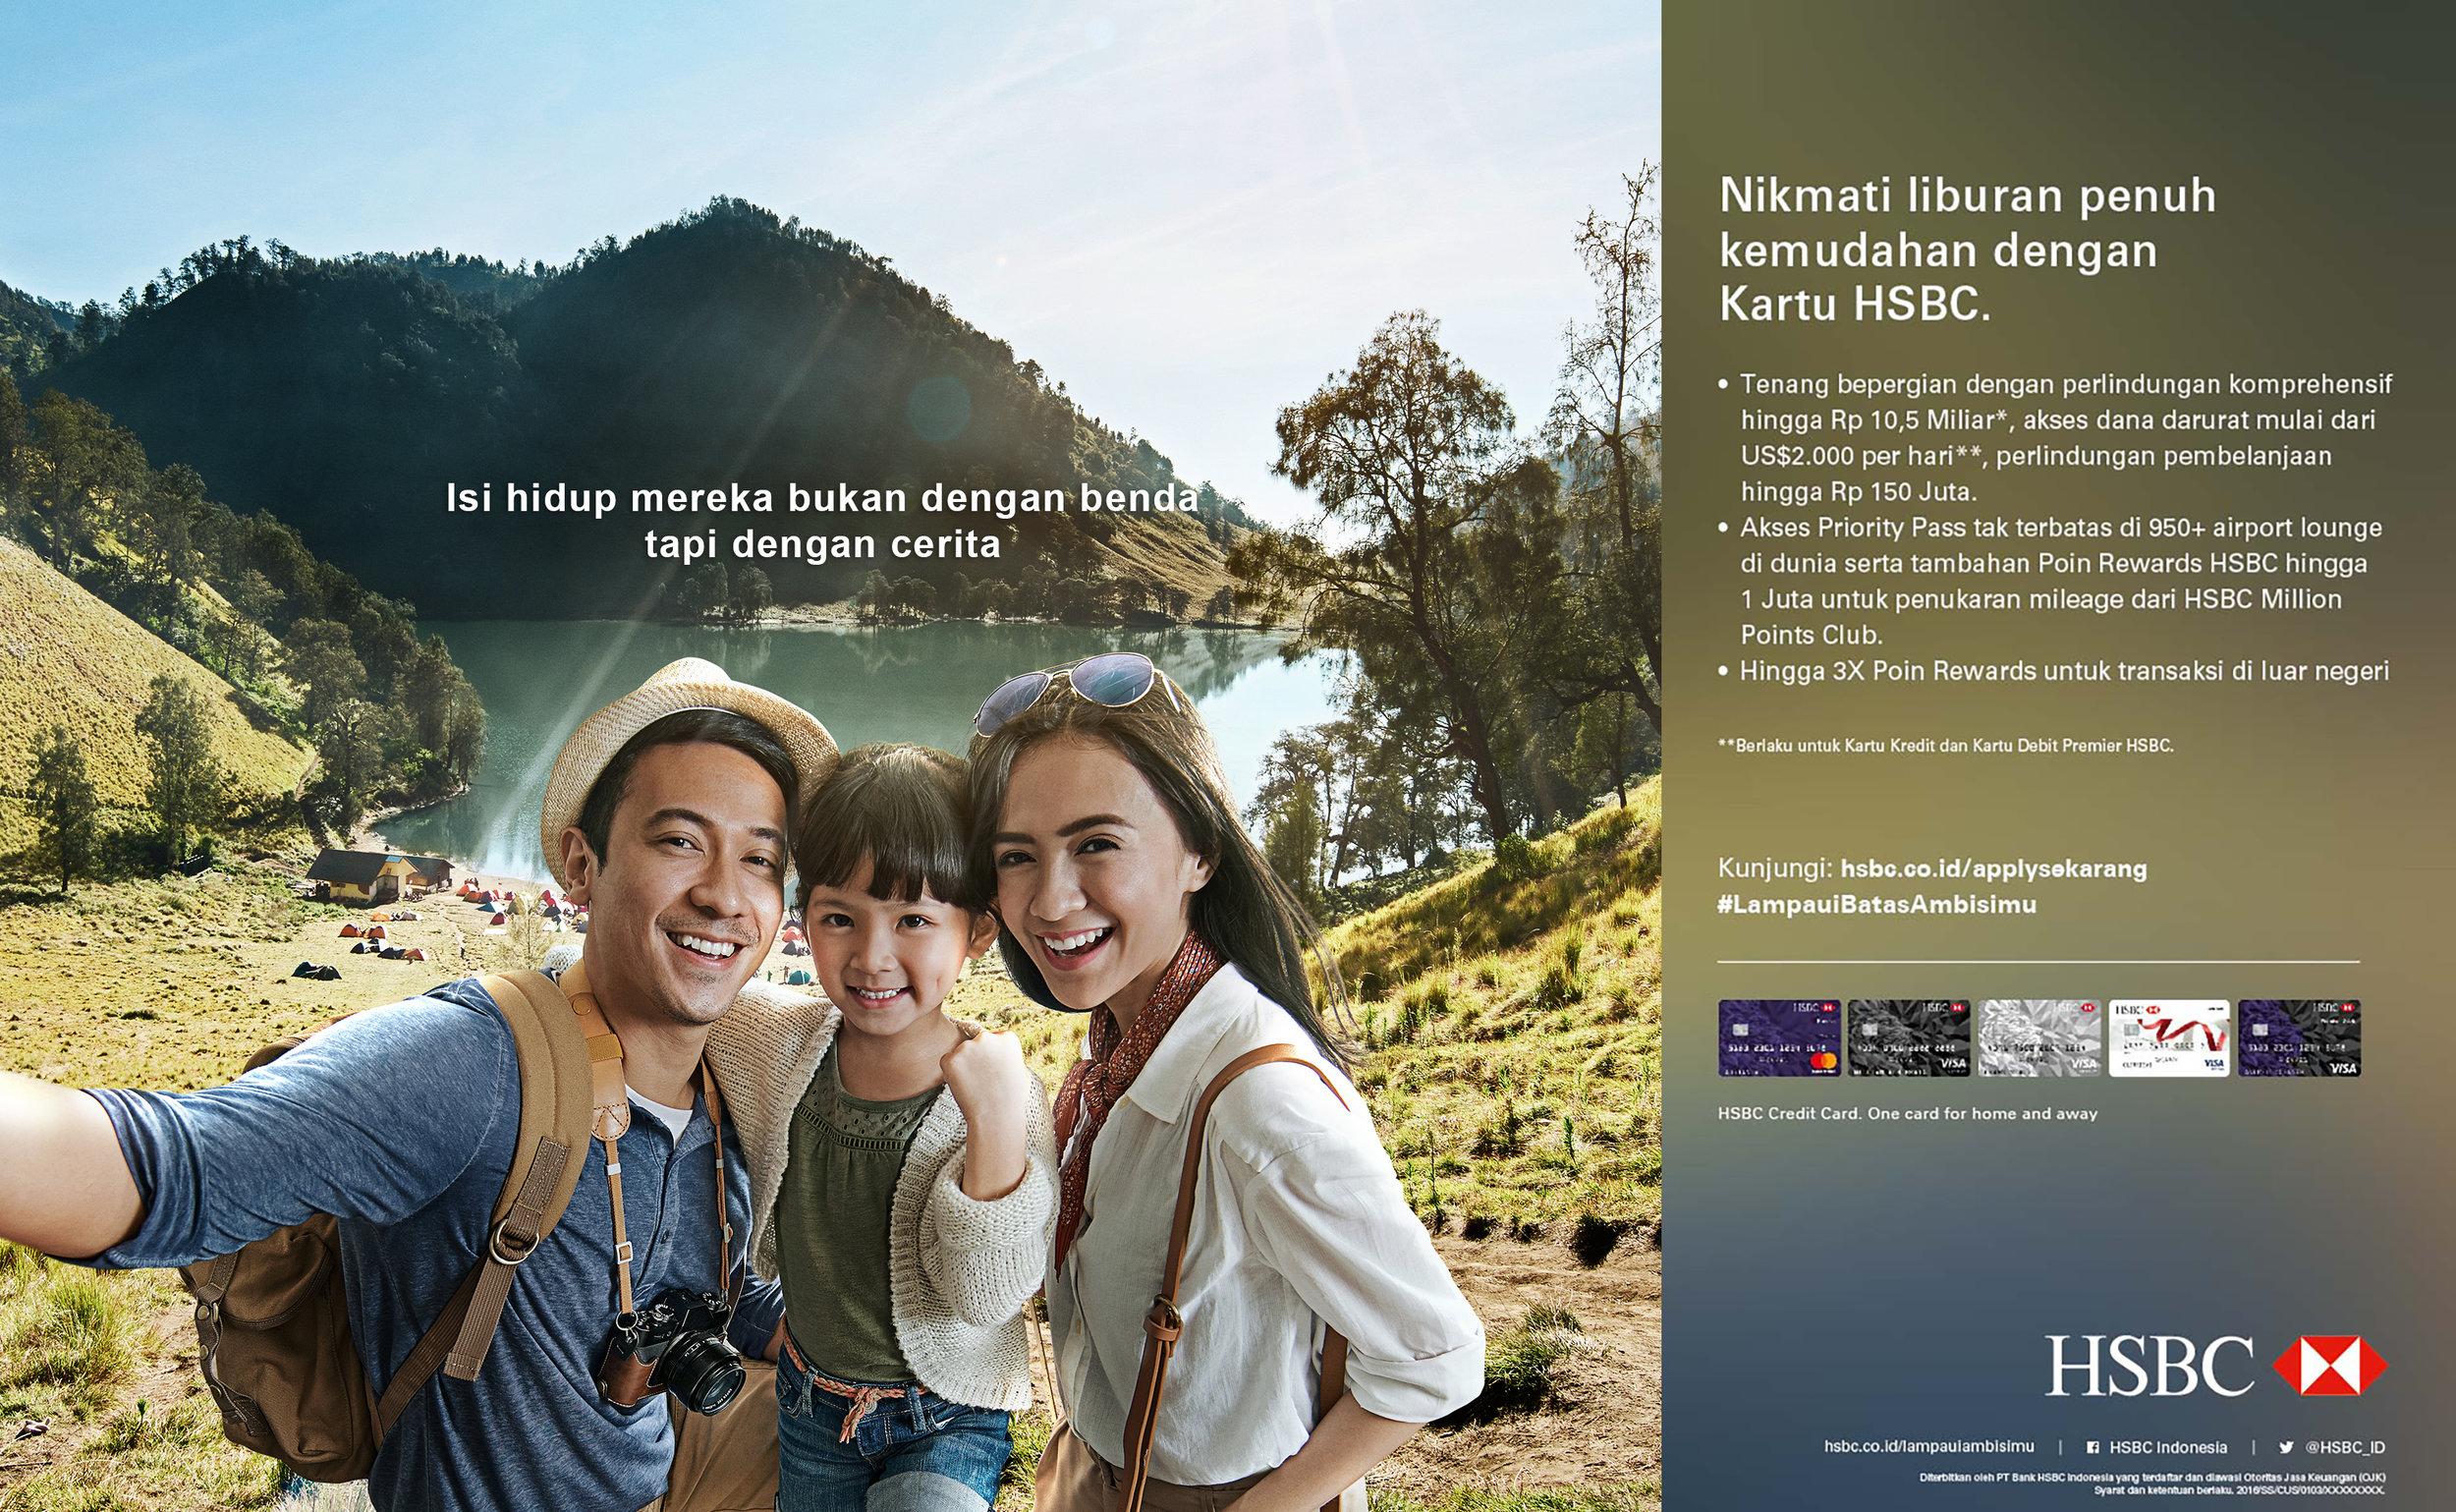 HSBC Travel Selfie_325x200mm-01.jpg